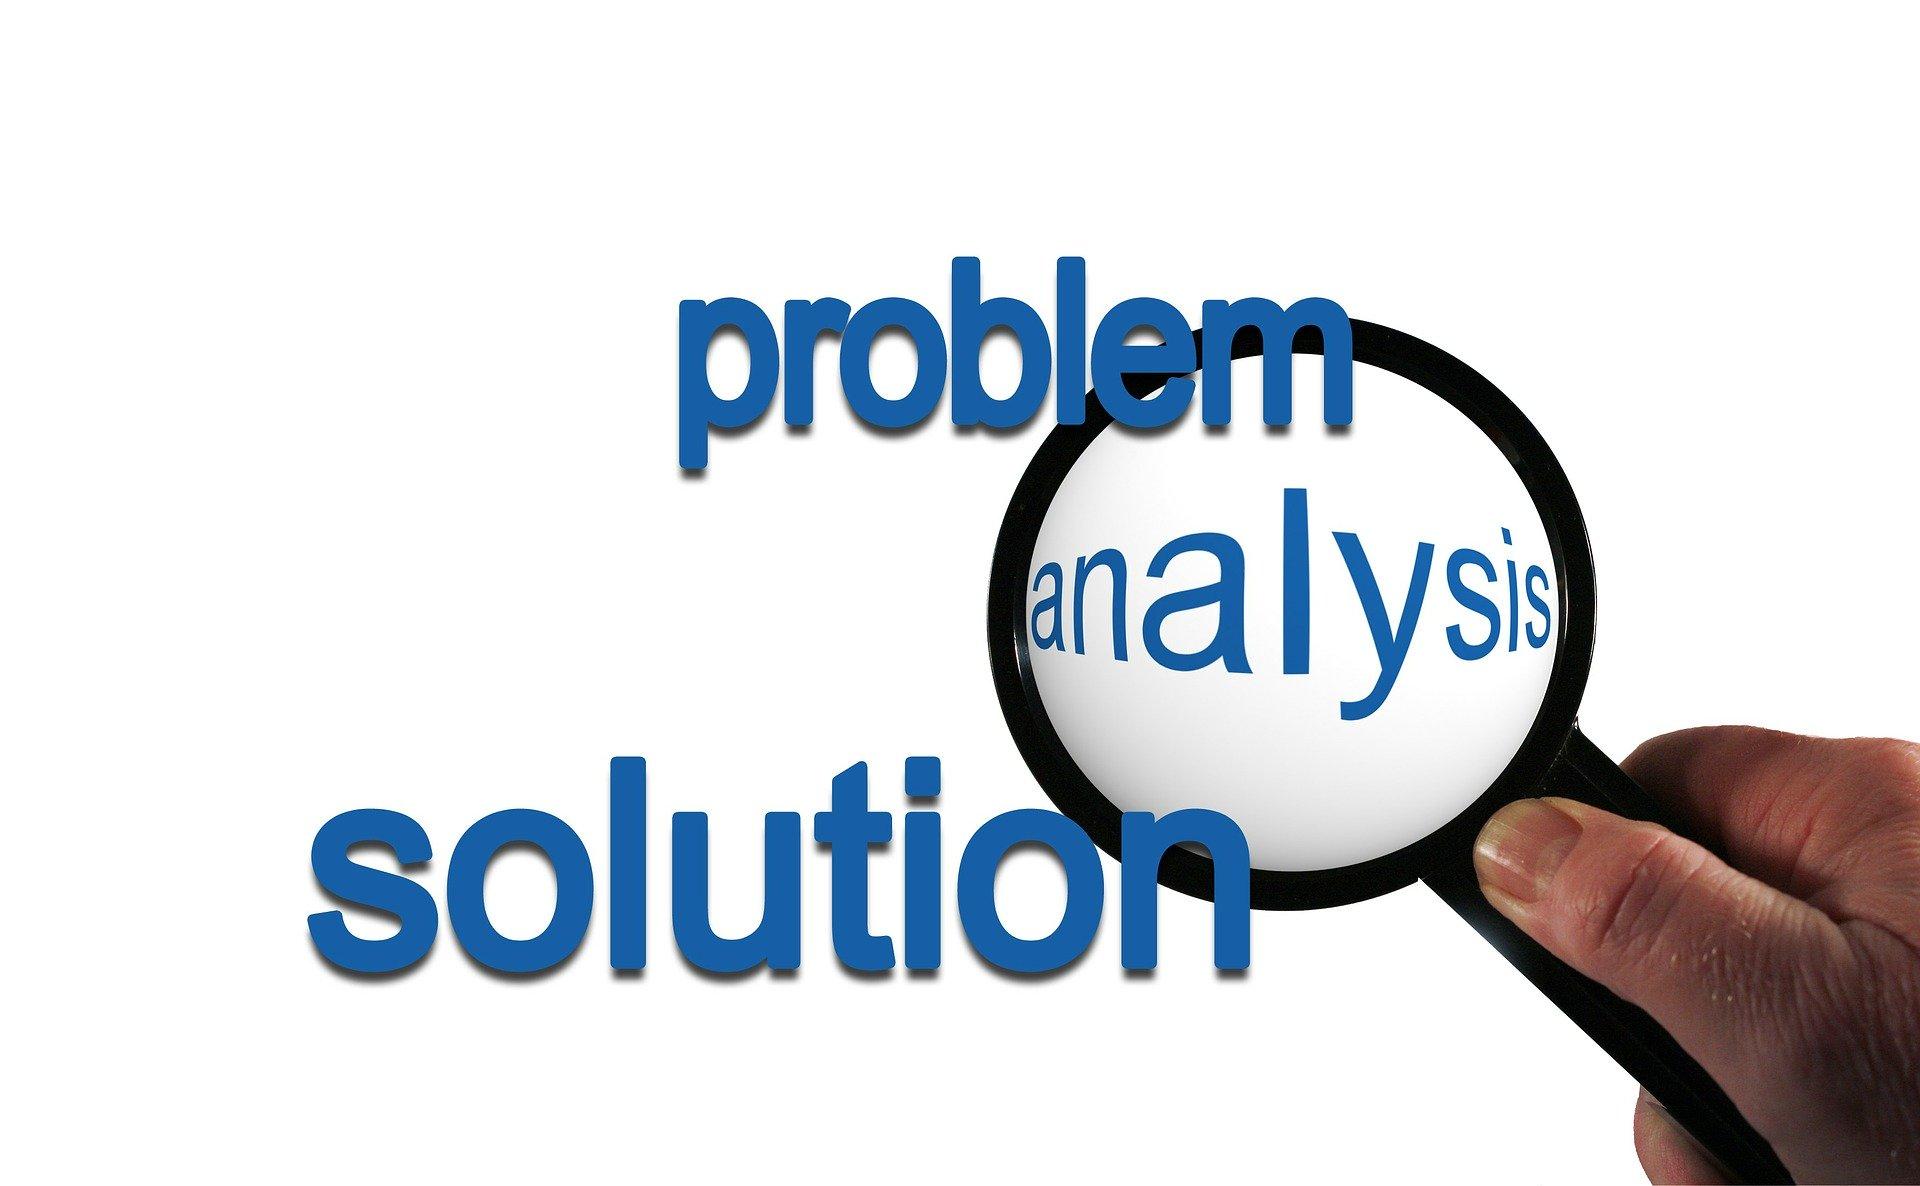 problem-67054_1920